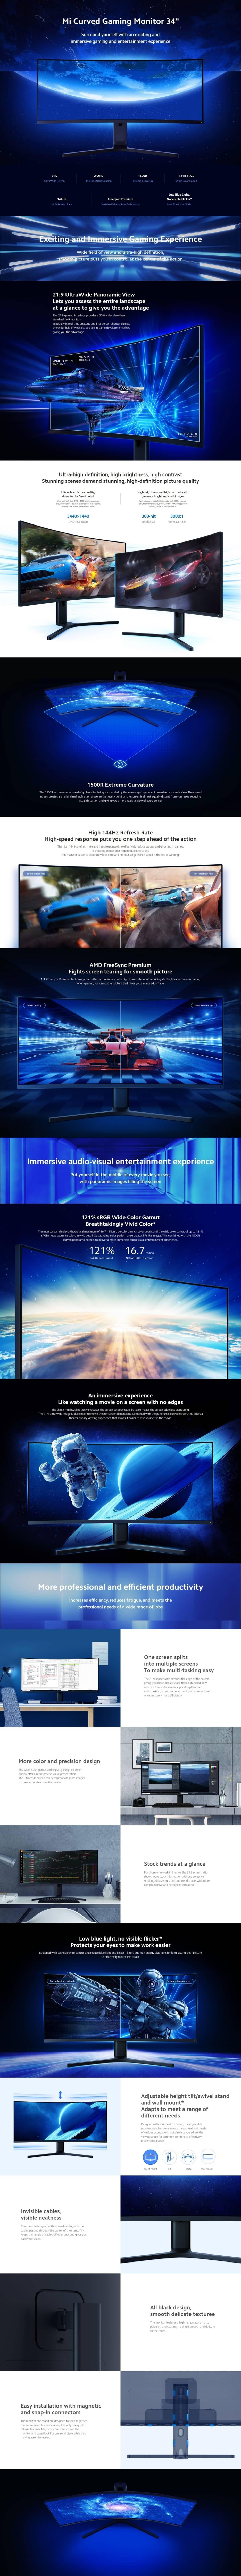 Xiaomi-Mi-Curved-Gaming-Monitor-34a75077a08b842269.jpg